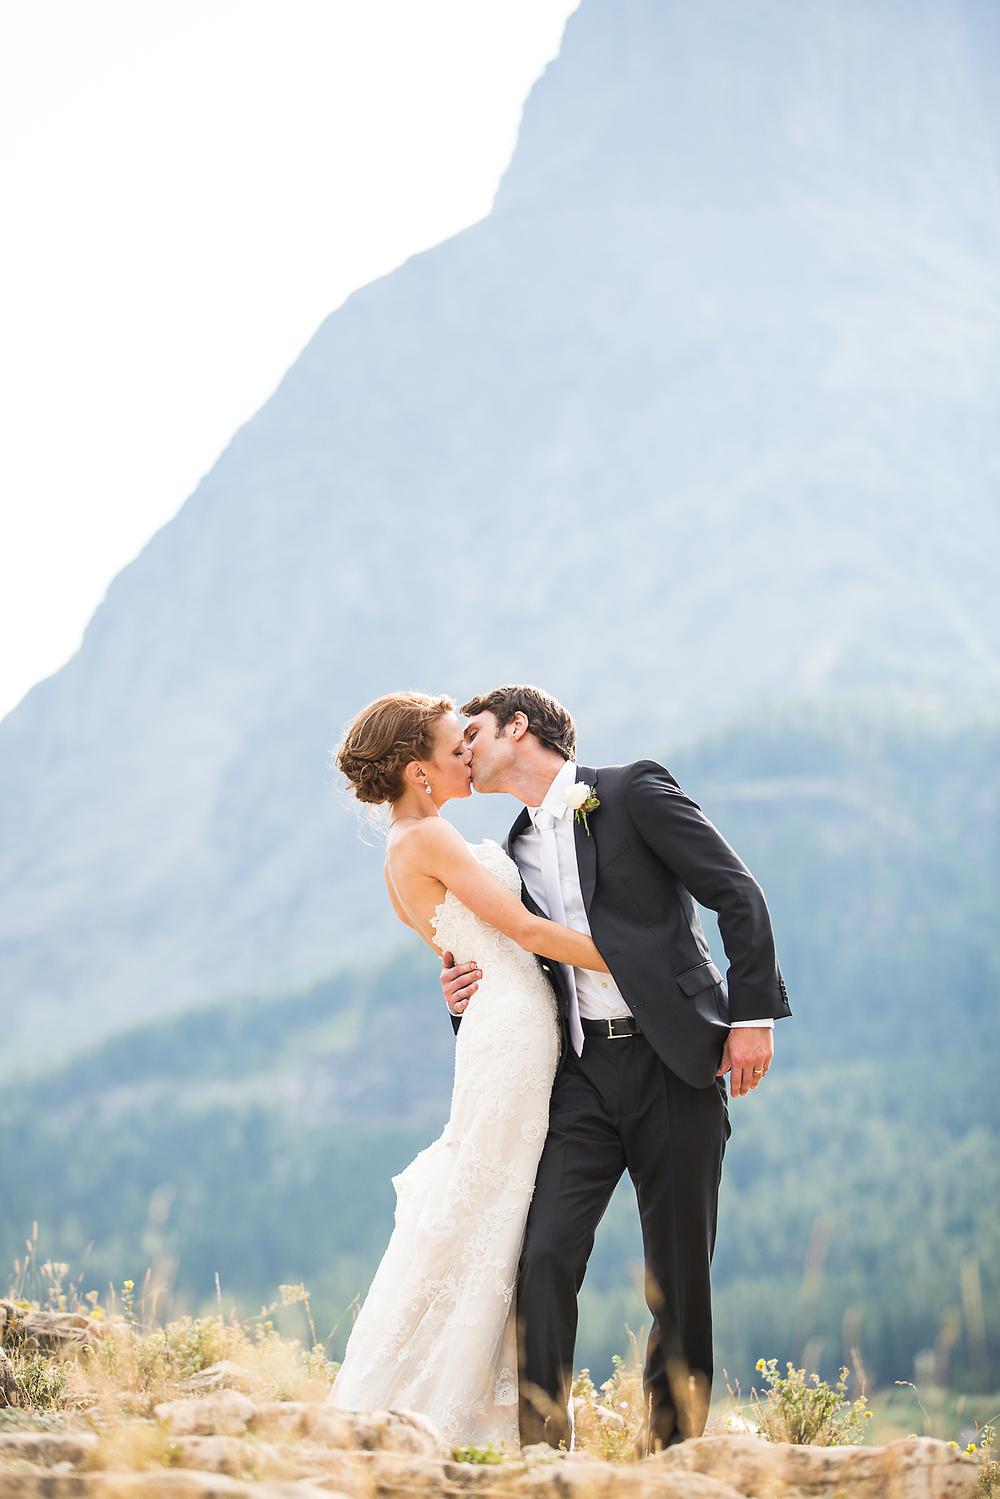 brett-birdsong-photography-082814-bride-groom-mountain.jpg